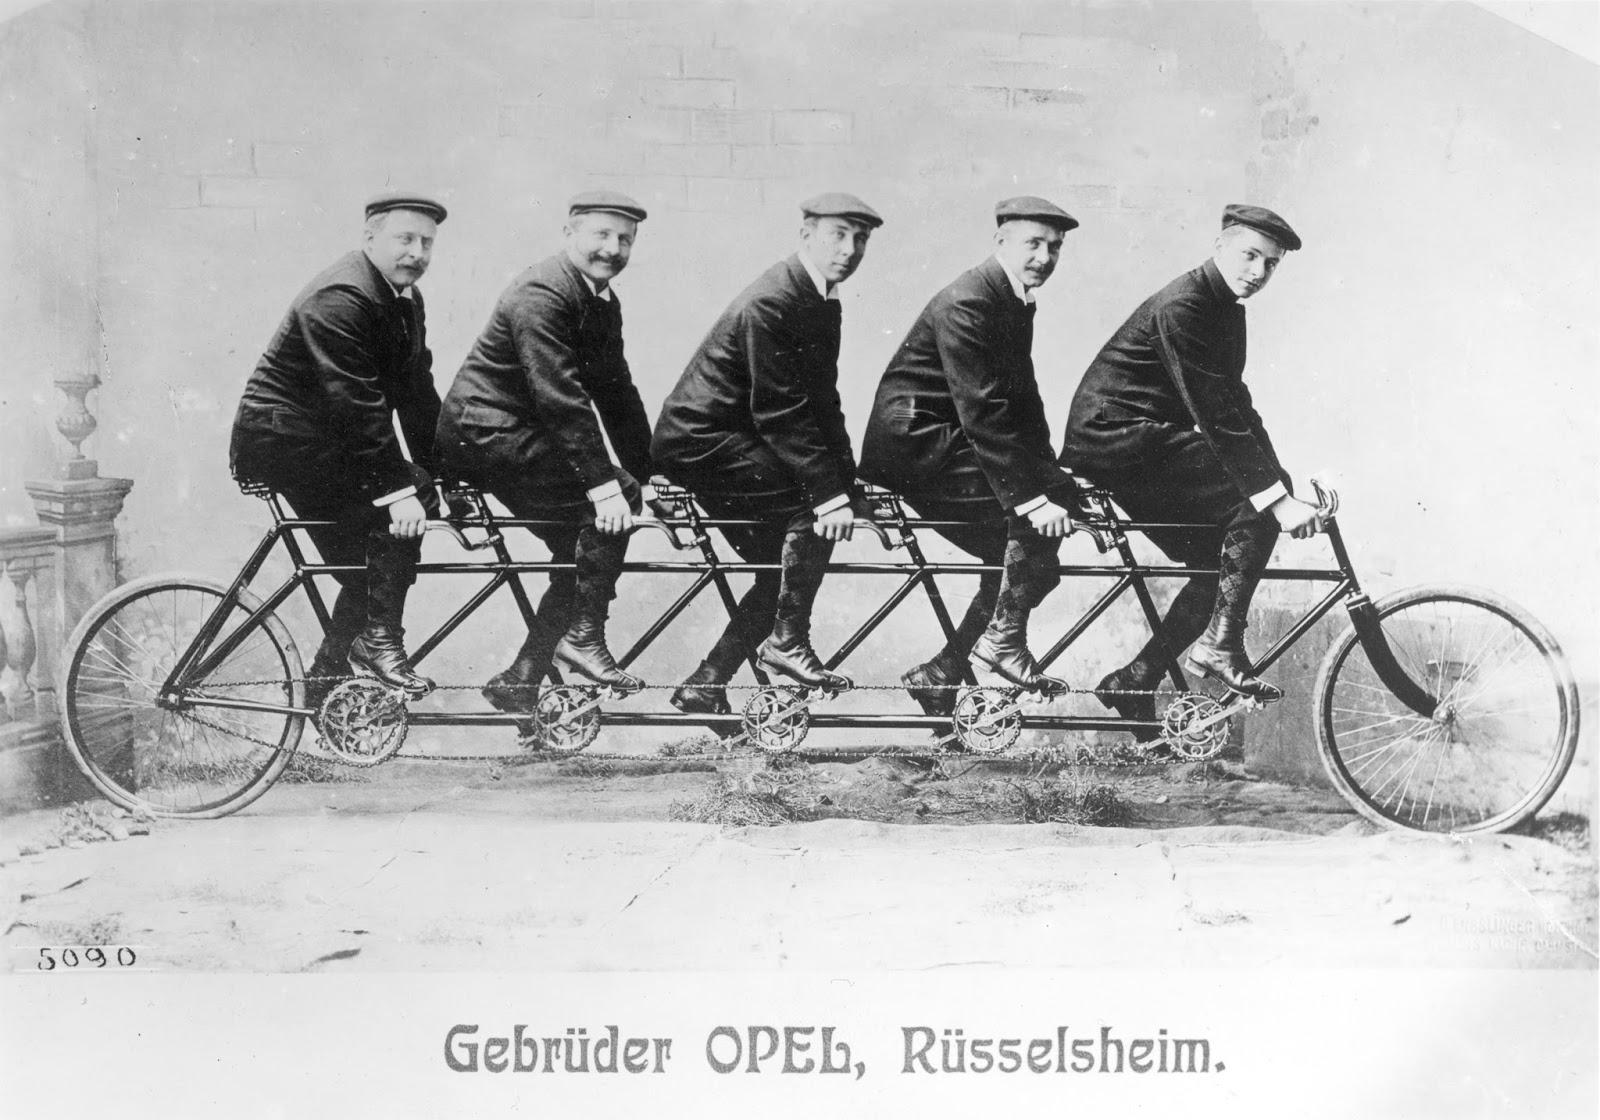 Opel 11311 Τα Ποδήλατα Opel Γιορτάζουν 130 Χρόνια Opel, ποδήλατα, ποδήλατο